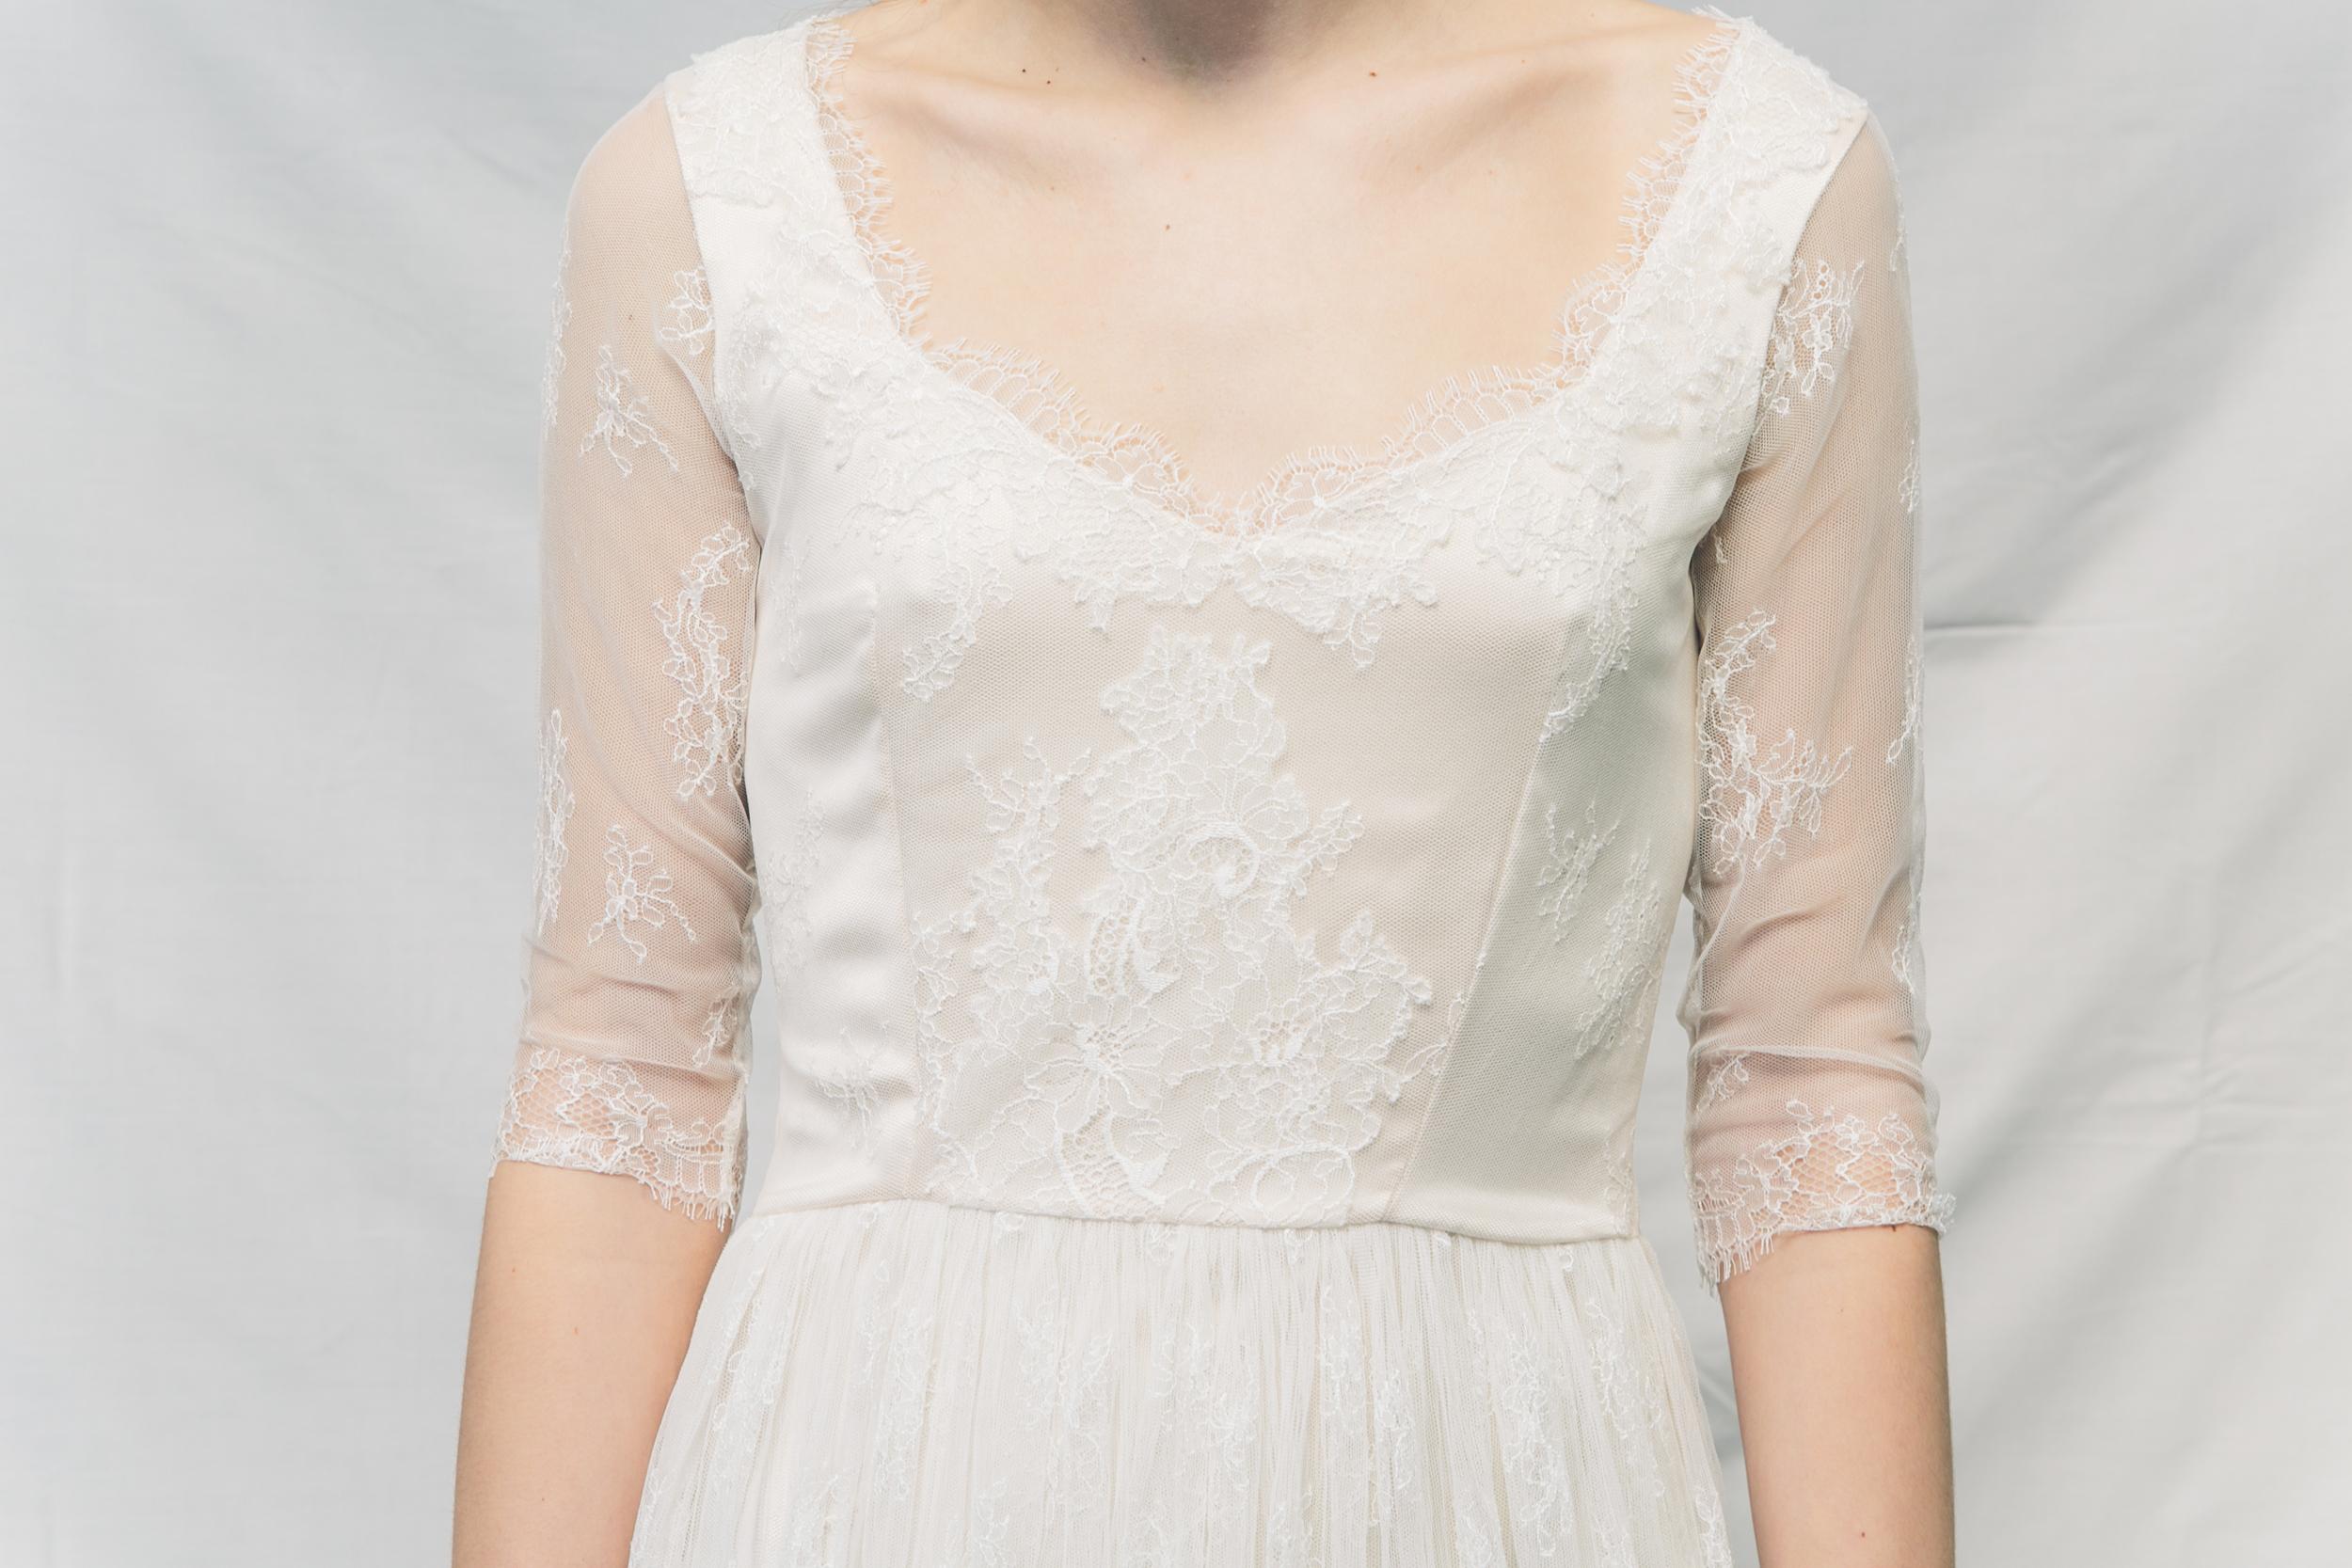 Kate-Beaumont-Wedding-Dresses-Sheffield-26.jpg